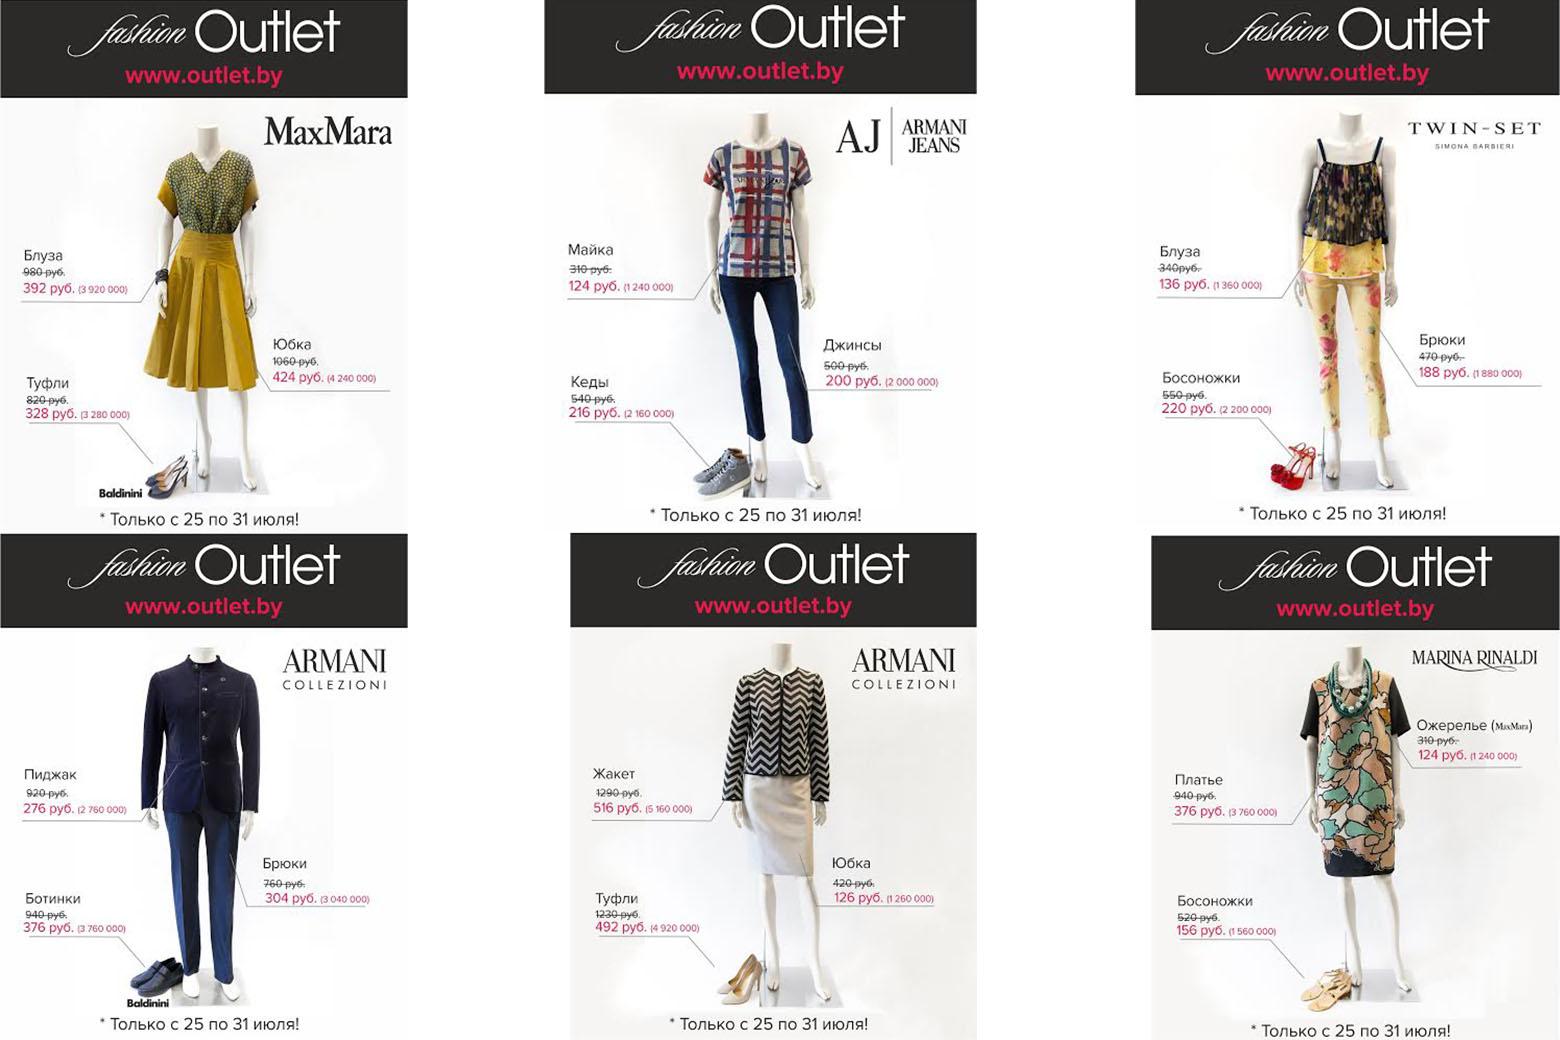 Fashion Outlet Sale